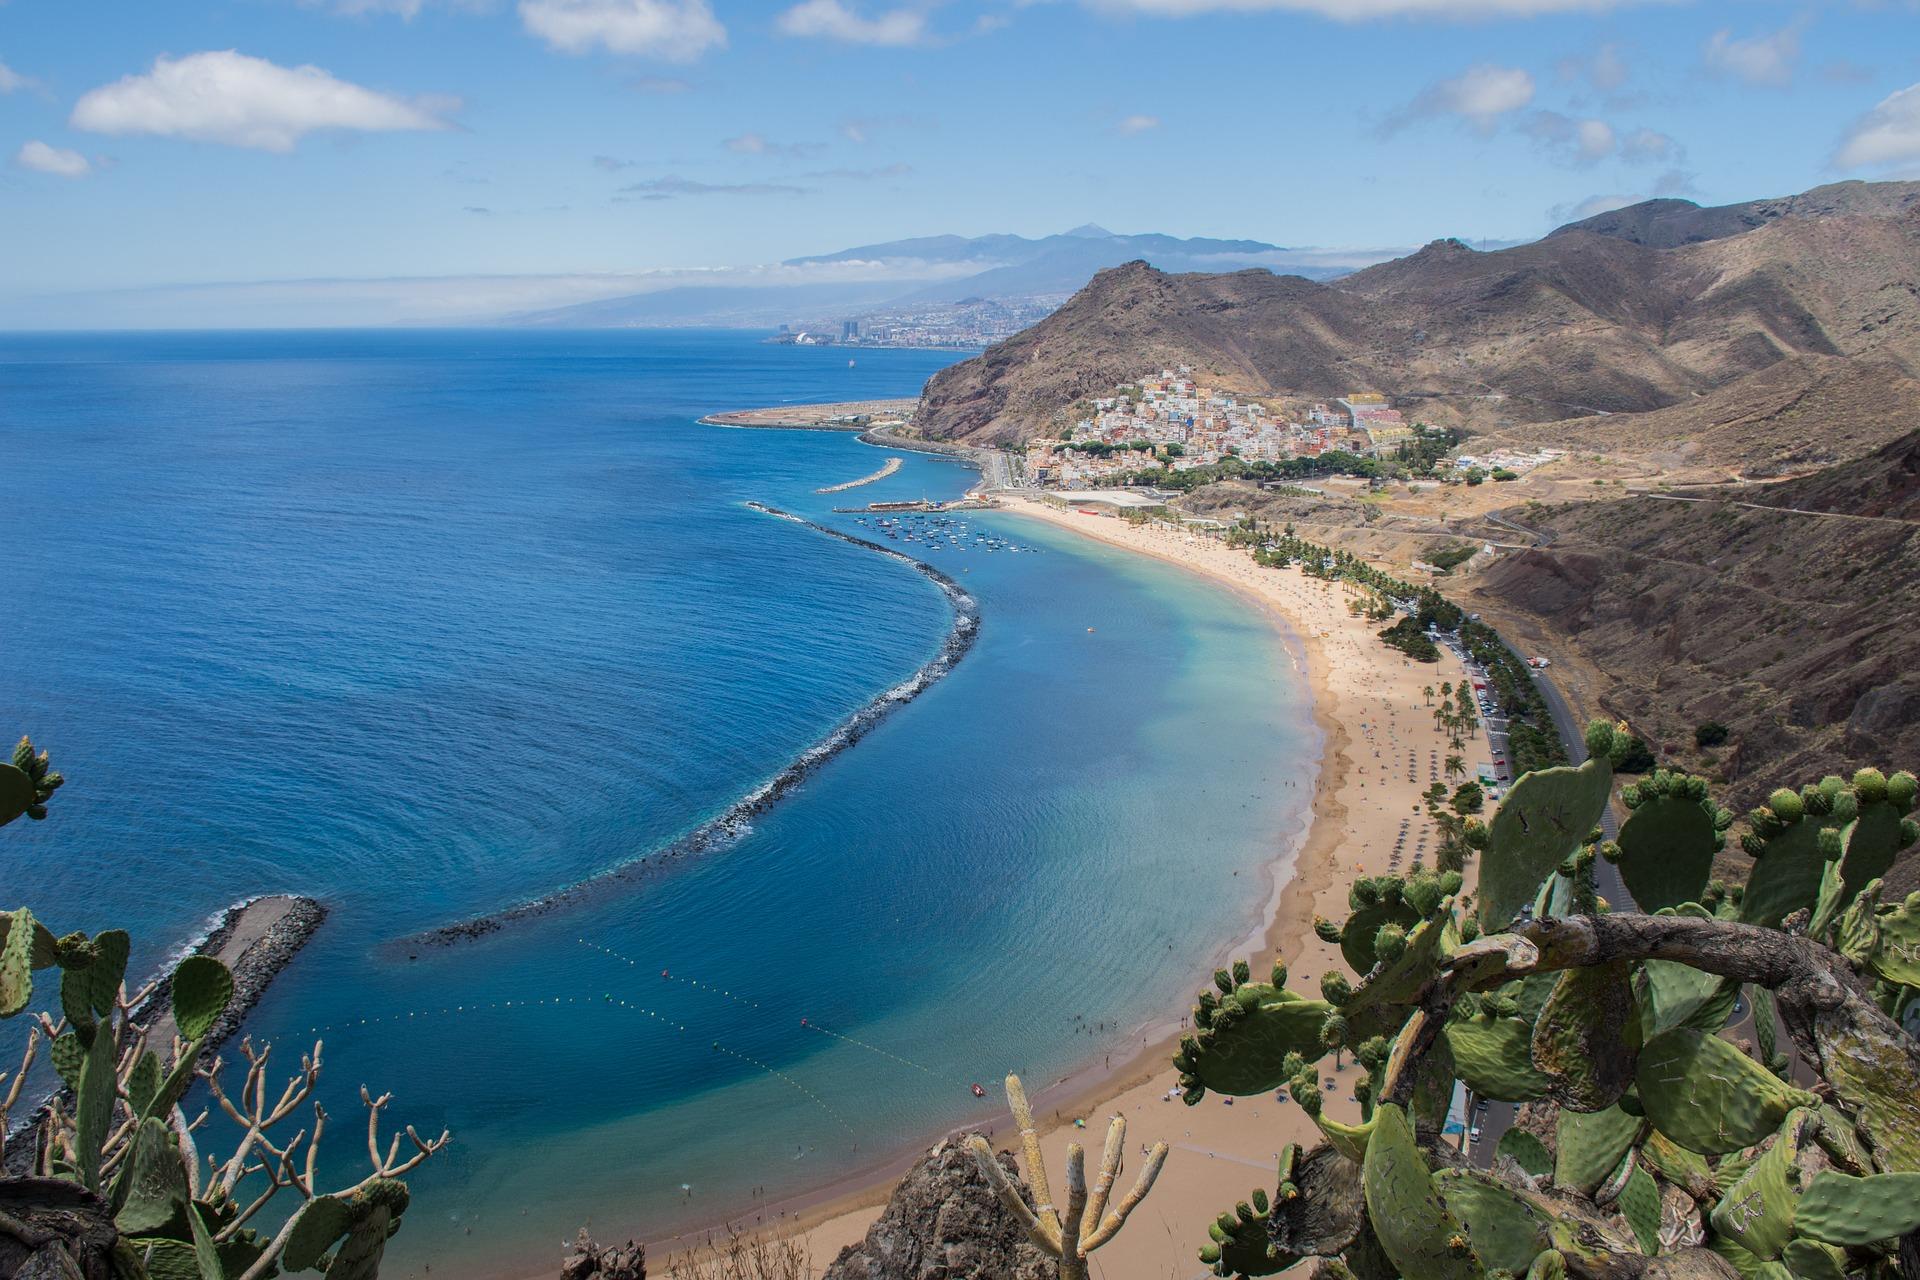 Naturiststrender Tenerife - theislandsinthesun.com